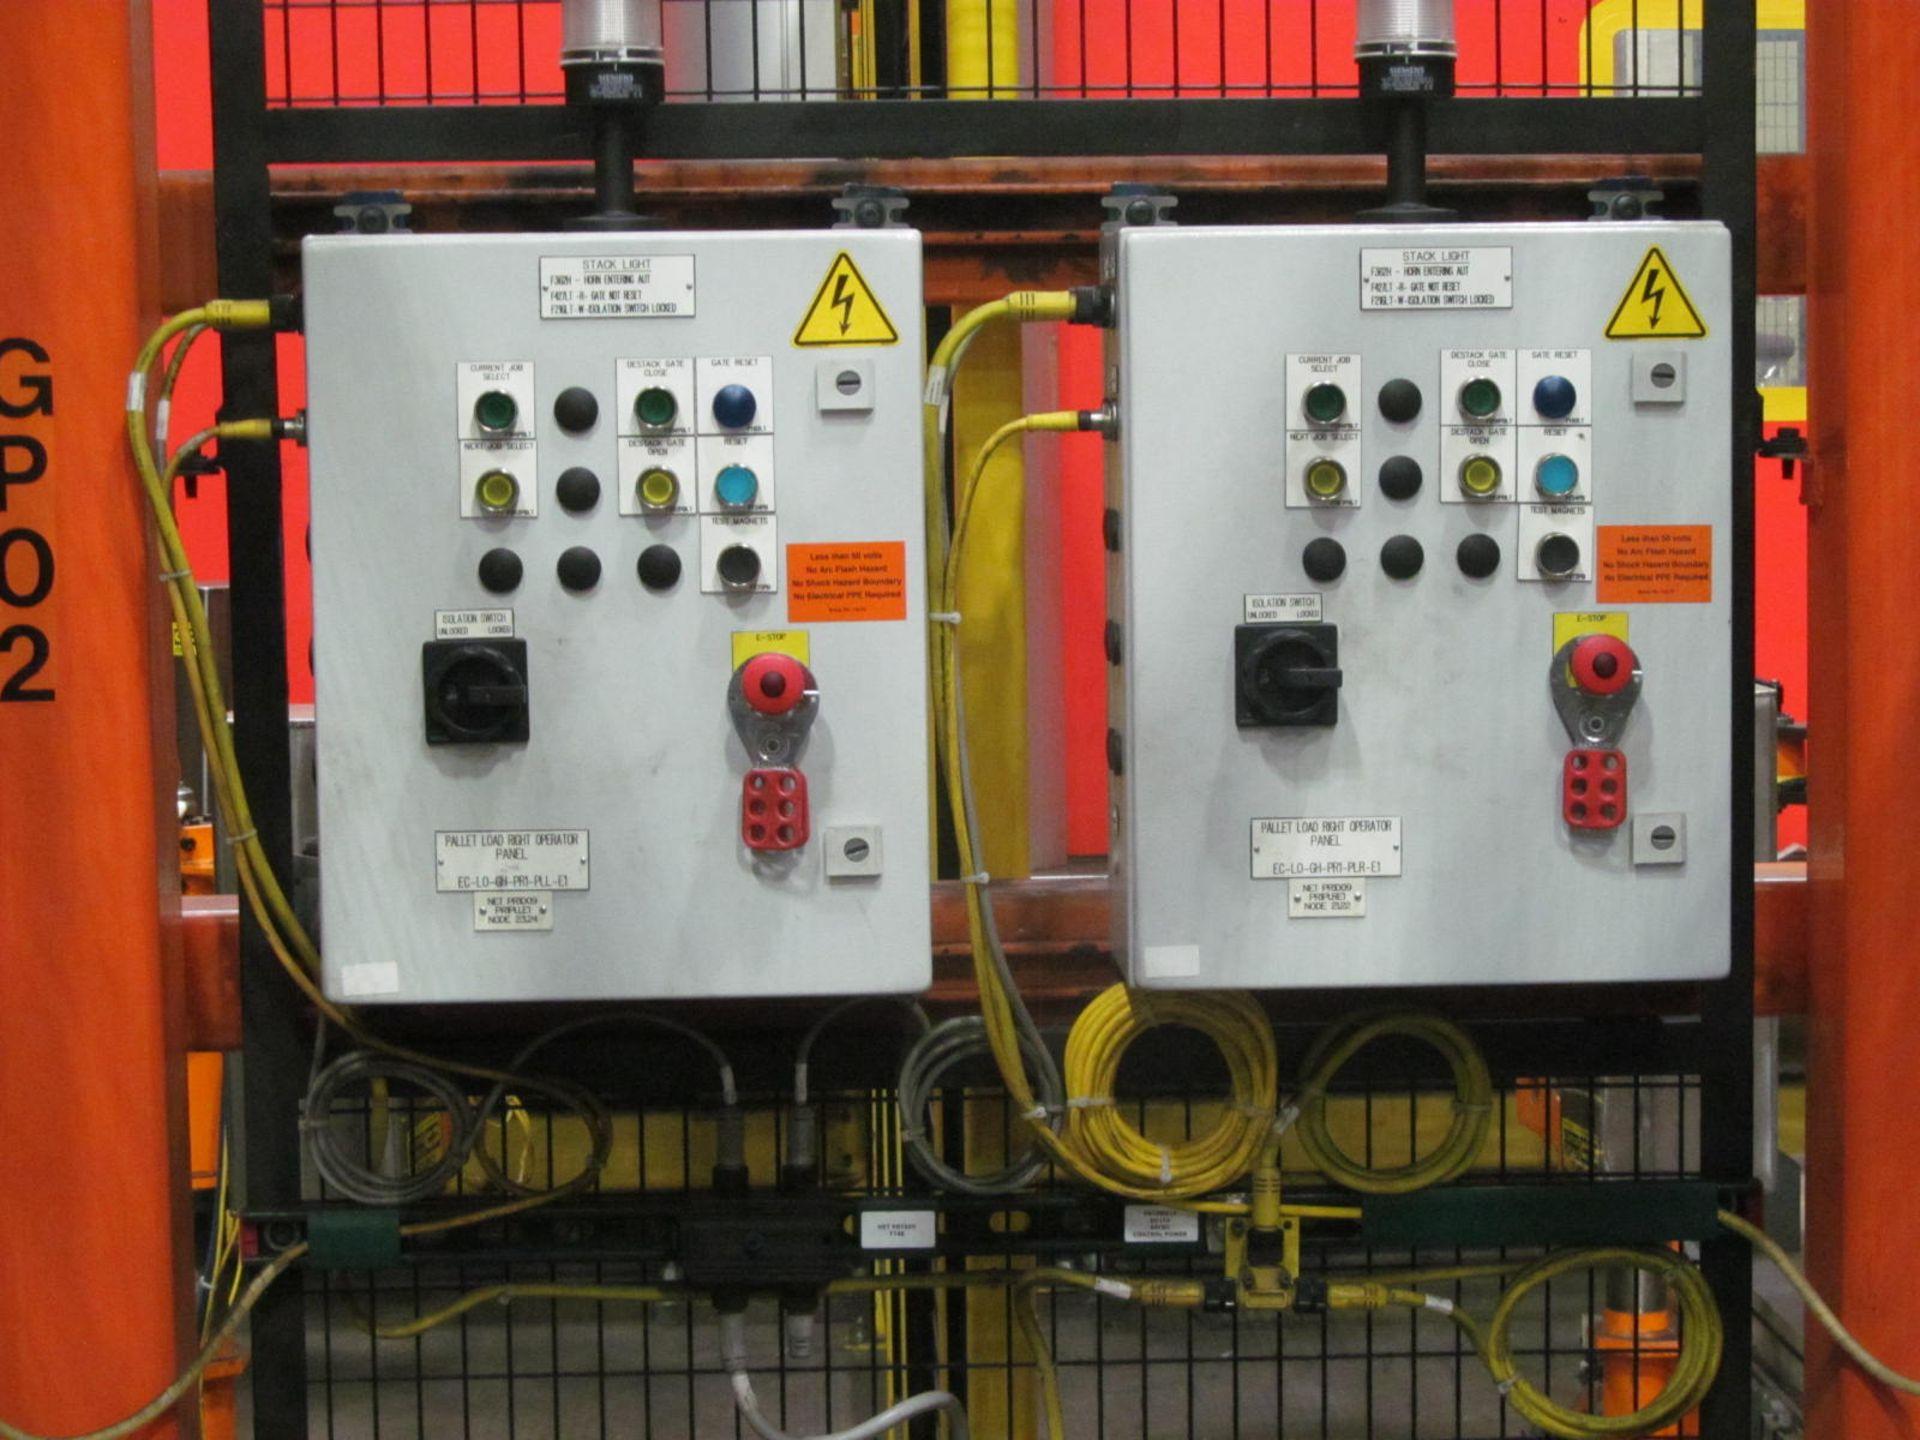 Lot 6 - BLANK LOADING STATION INCLUDING; 7-AXIS FANUC 2000iB 100P ROBOT w/ R-30iA CONTROL & TEACH PAD